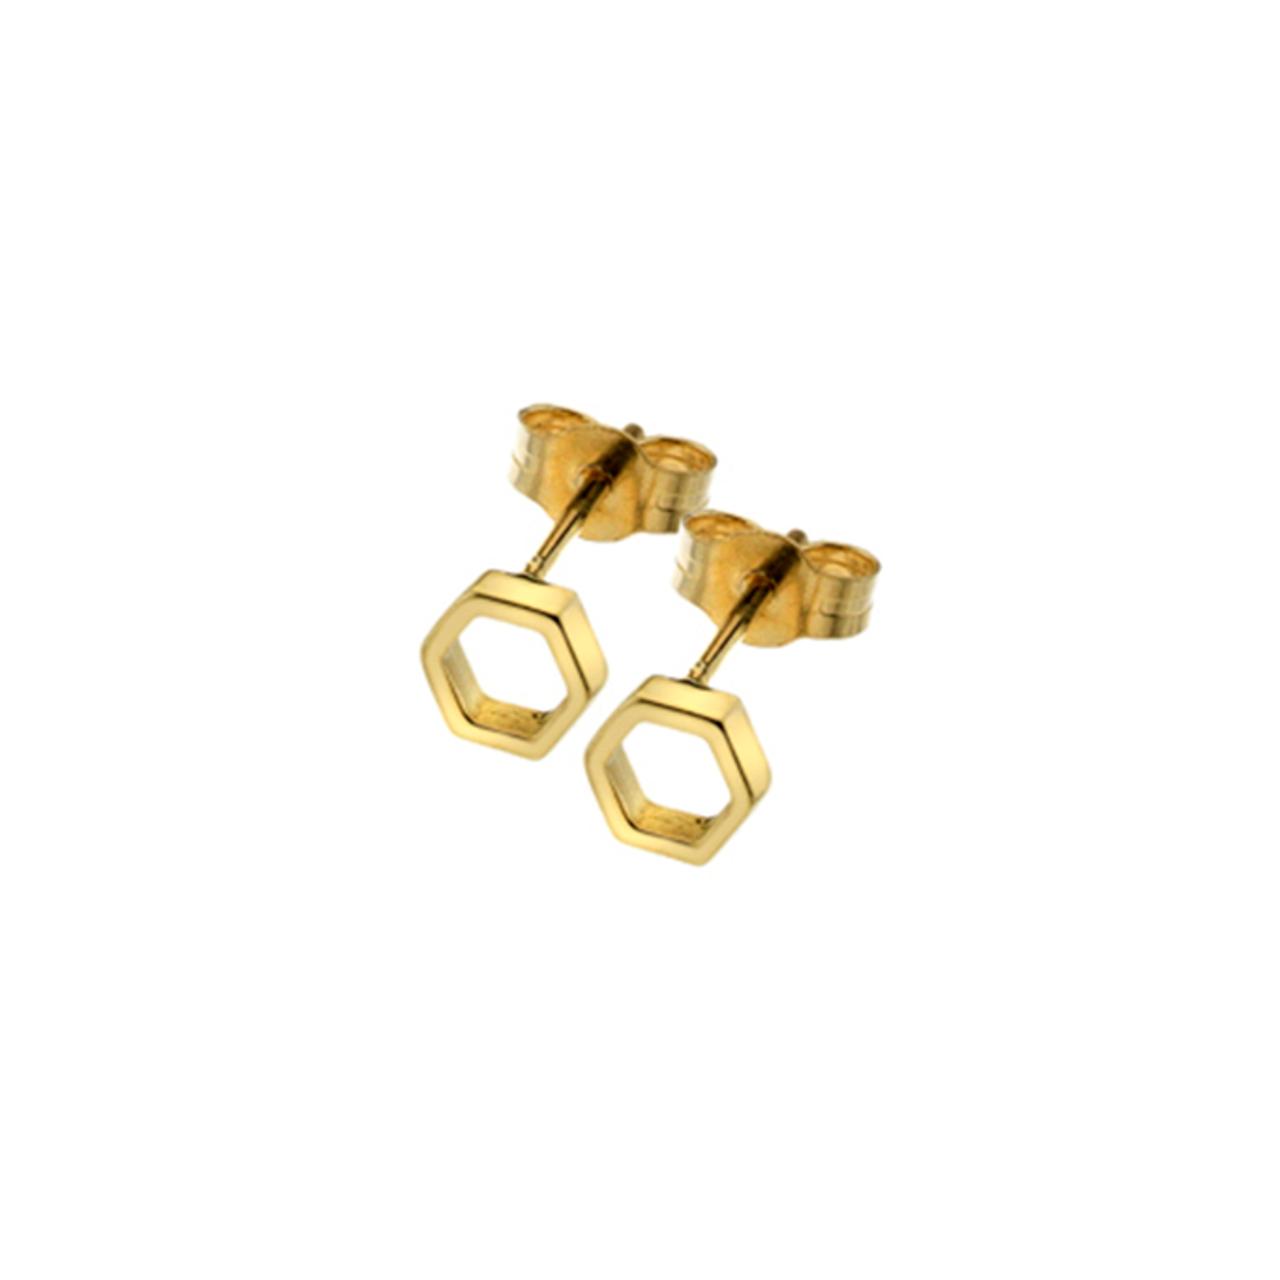 9ct Yellow Gold open hexagonal Stud Earrings